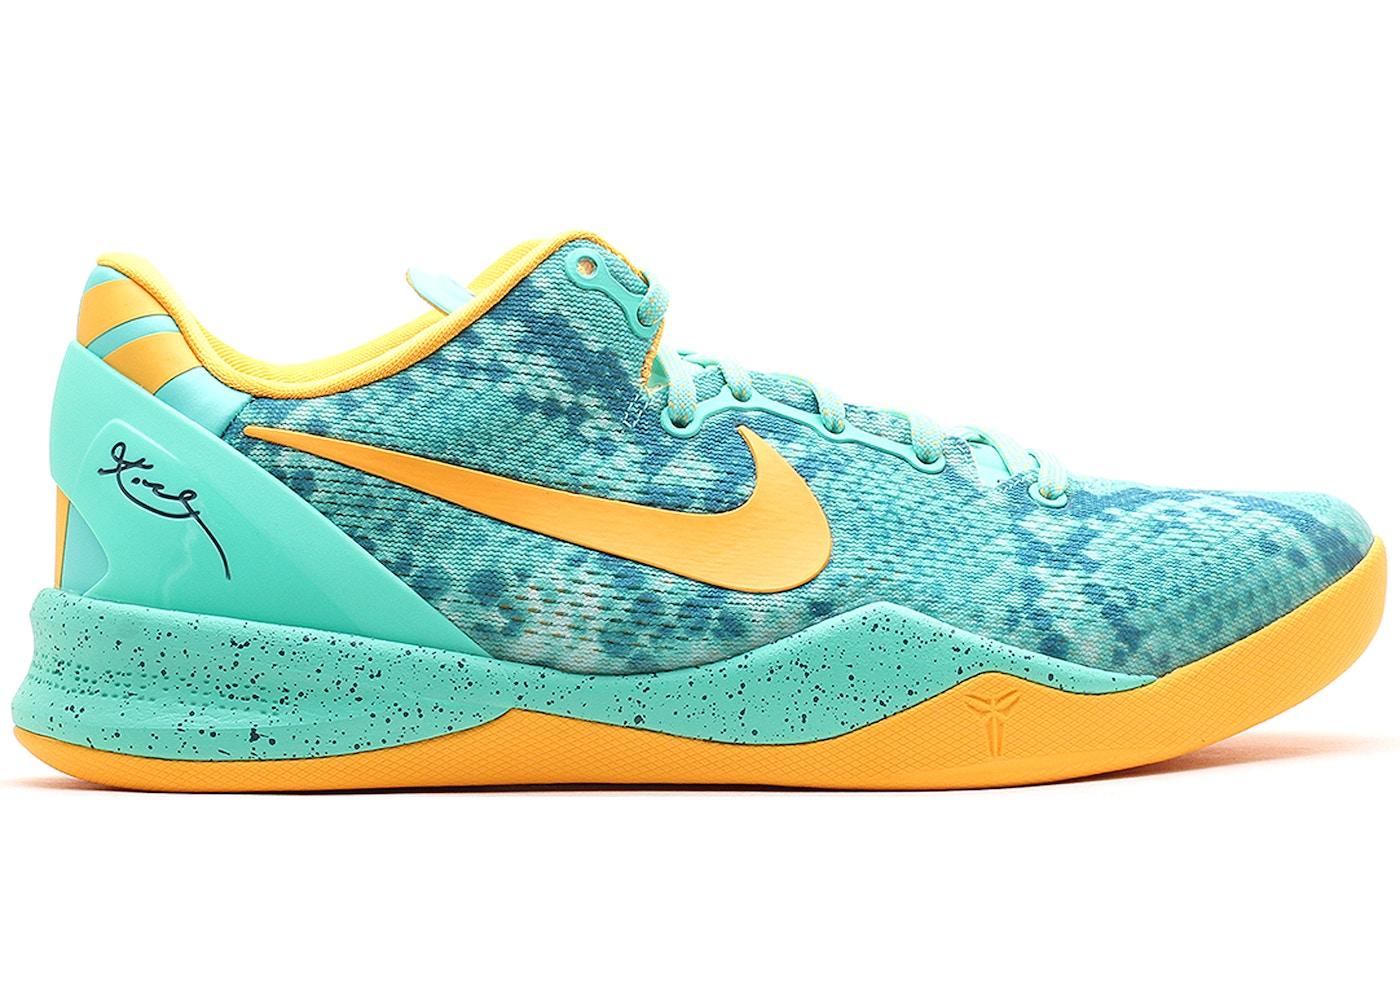 finest selection 6e31d 54077 Nike Kobe 8 Shoes - Last Sale